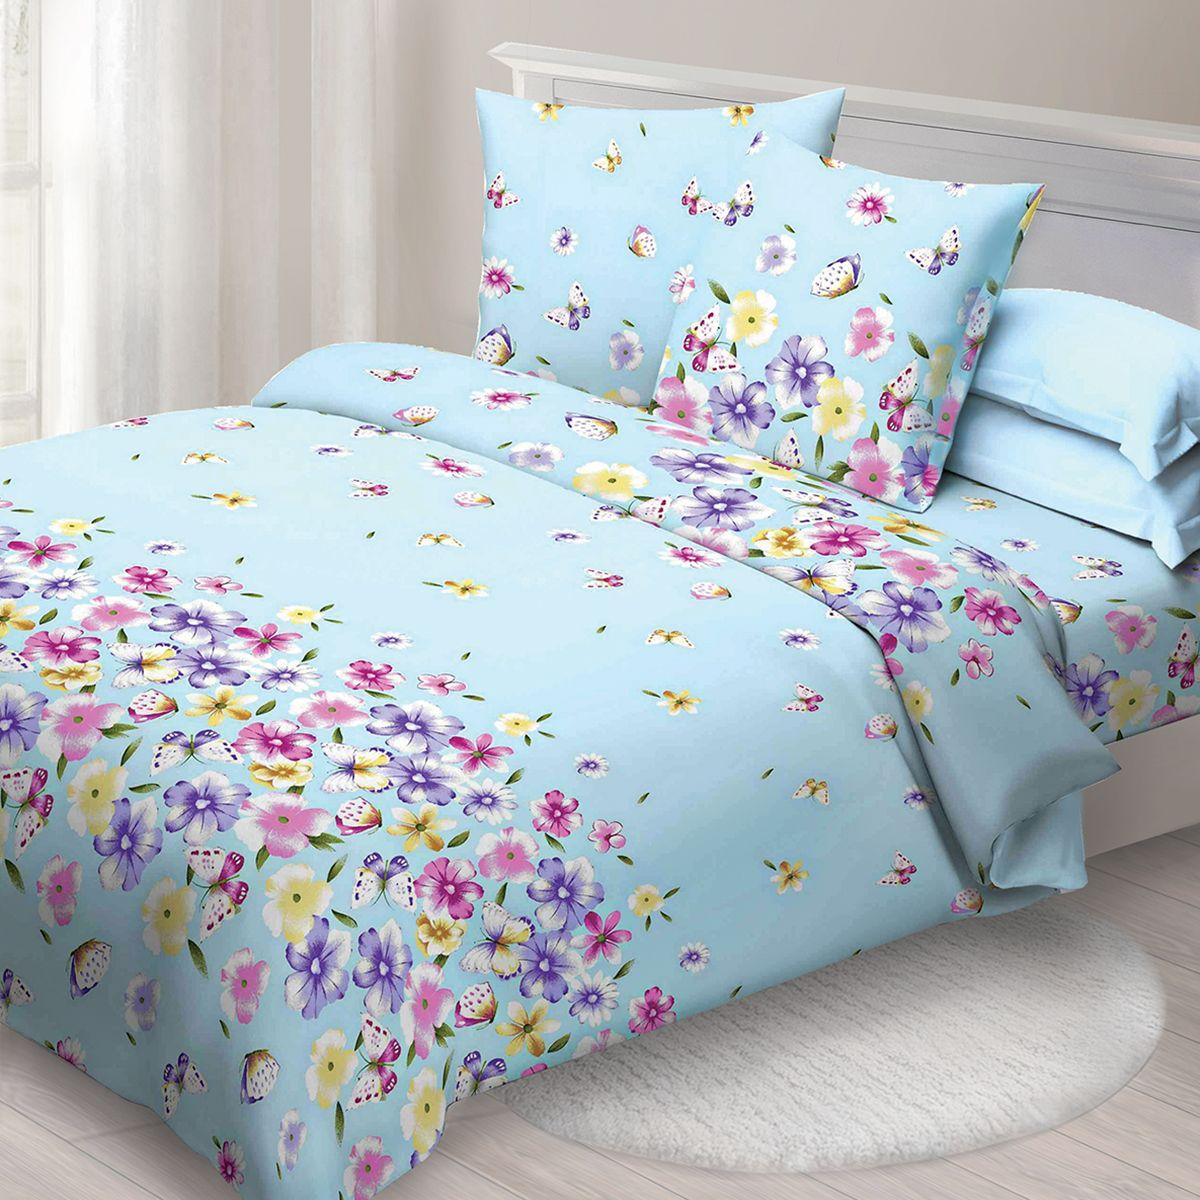 Комплект белья Спал Спалыч Летний день, евро, наволочки 70x70, цвет: голубой. 1271-182473